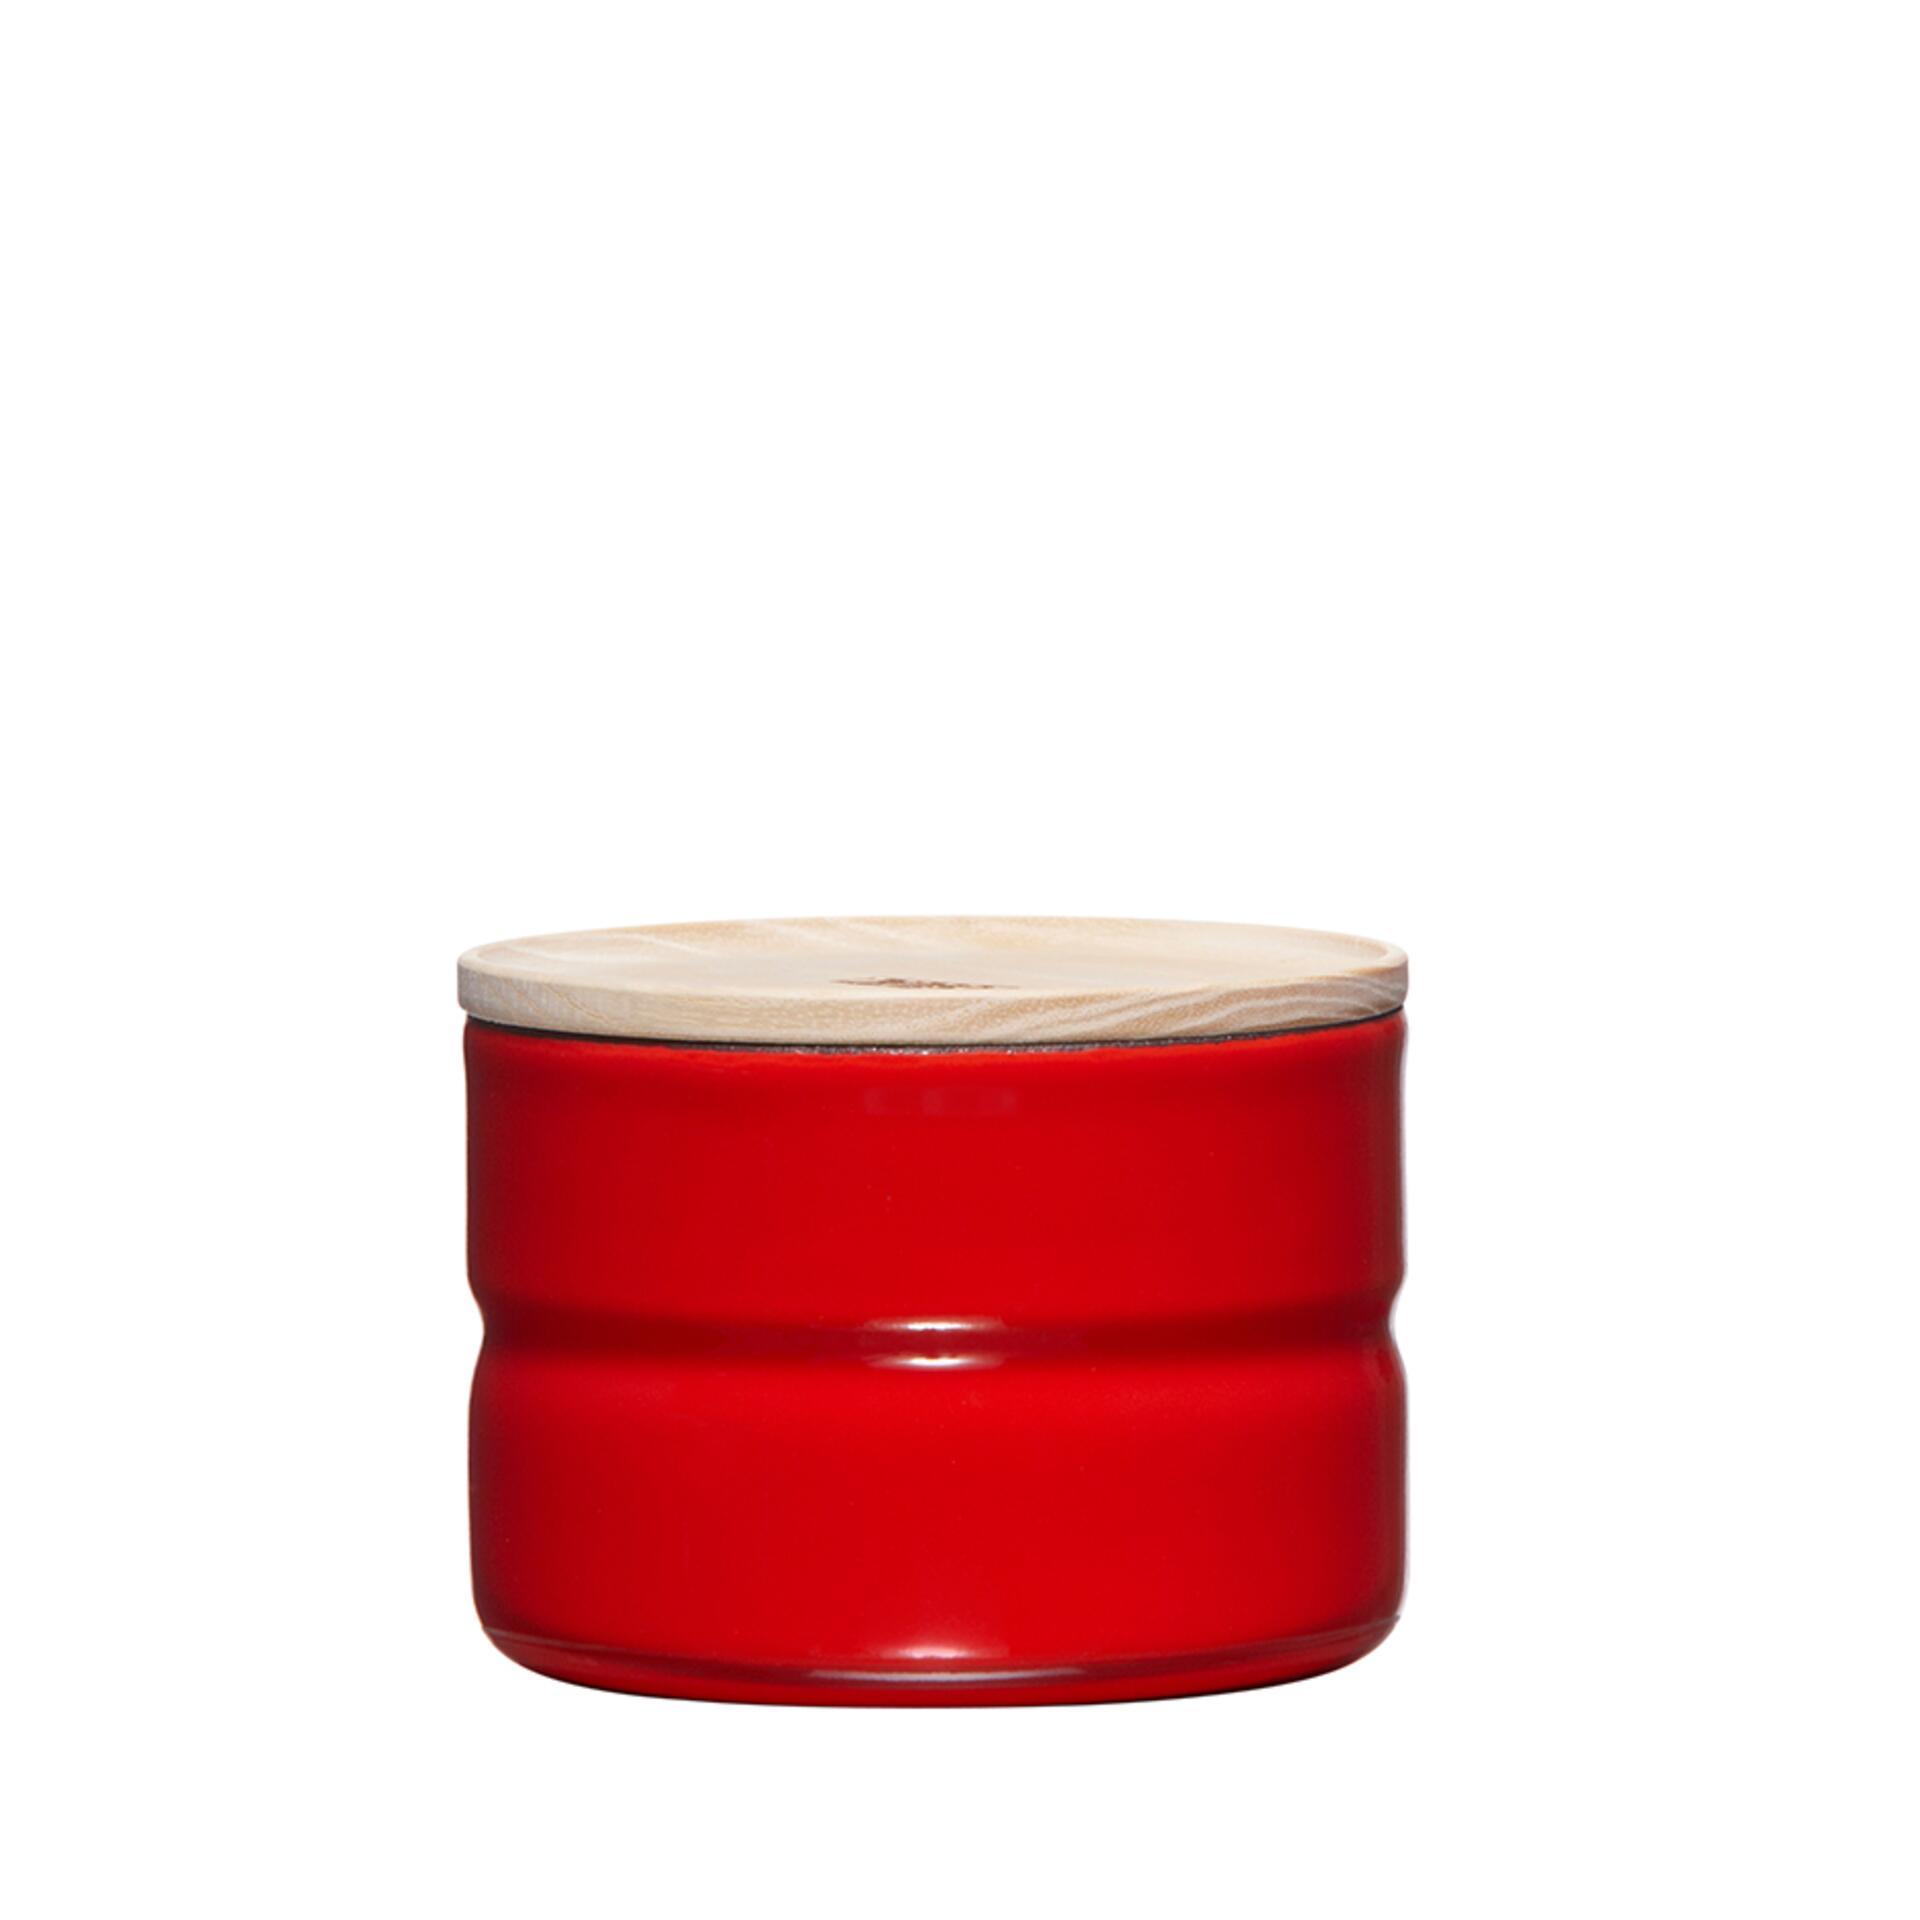 Riess Vorratsdose 230 ml Rot